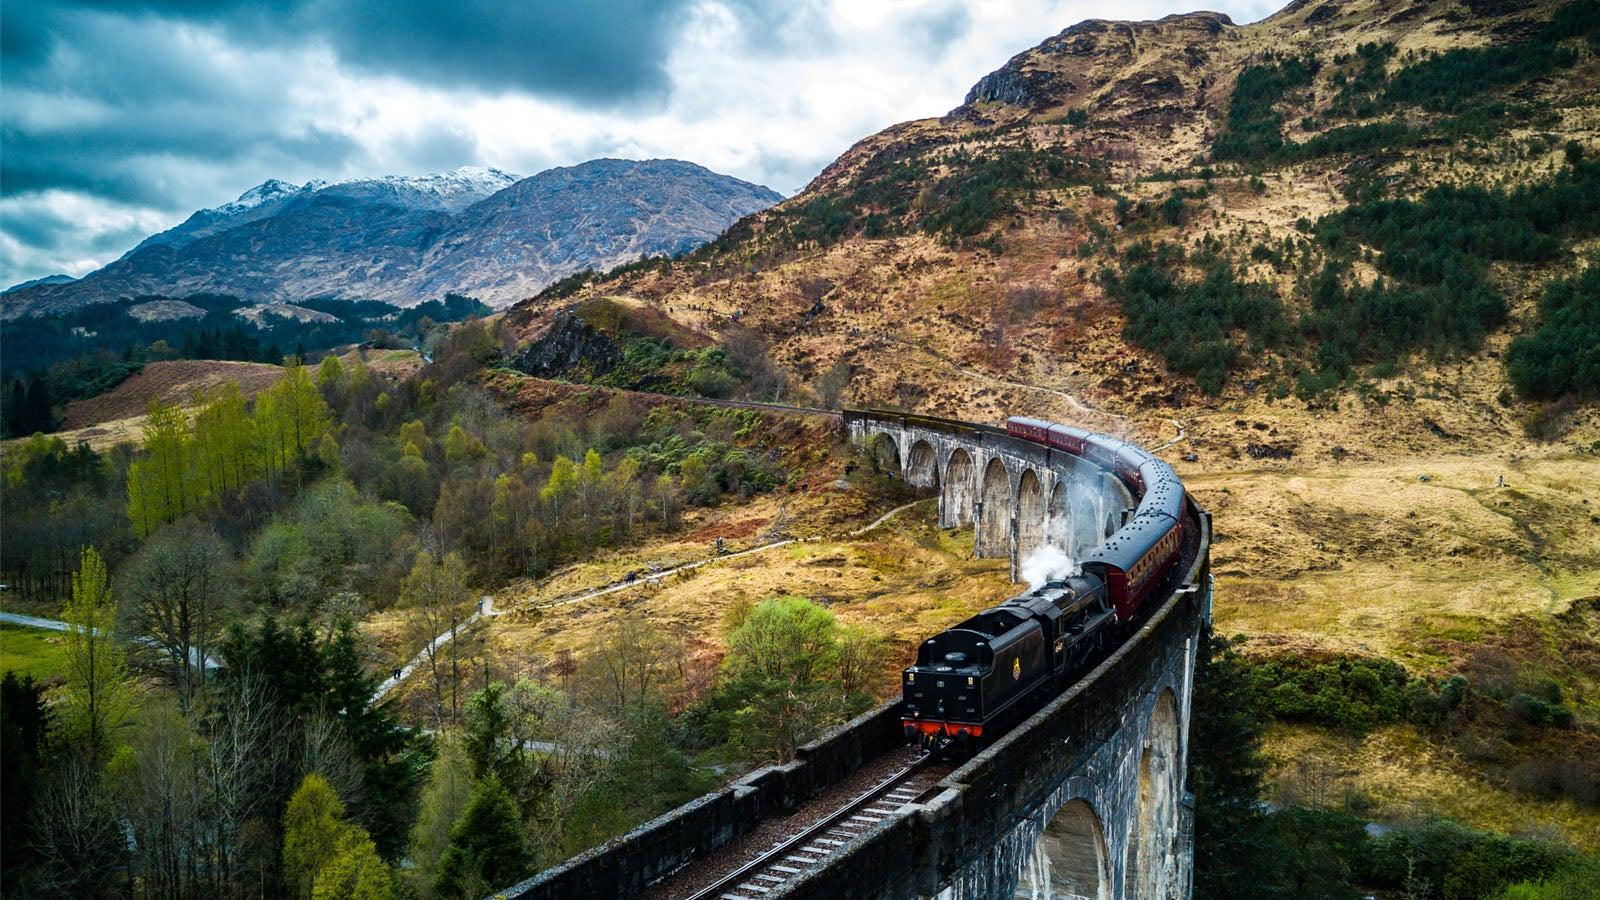 Train in St Andrews, Scotland